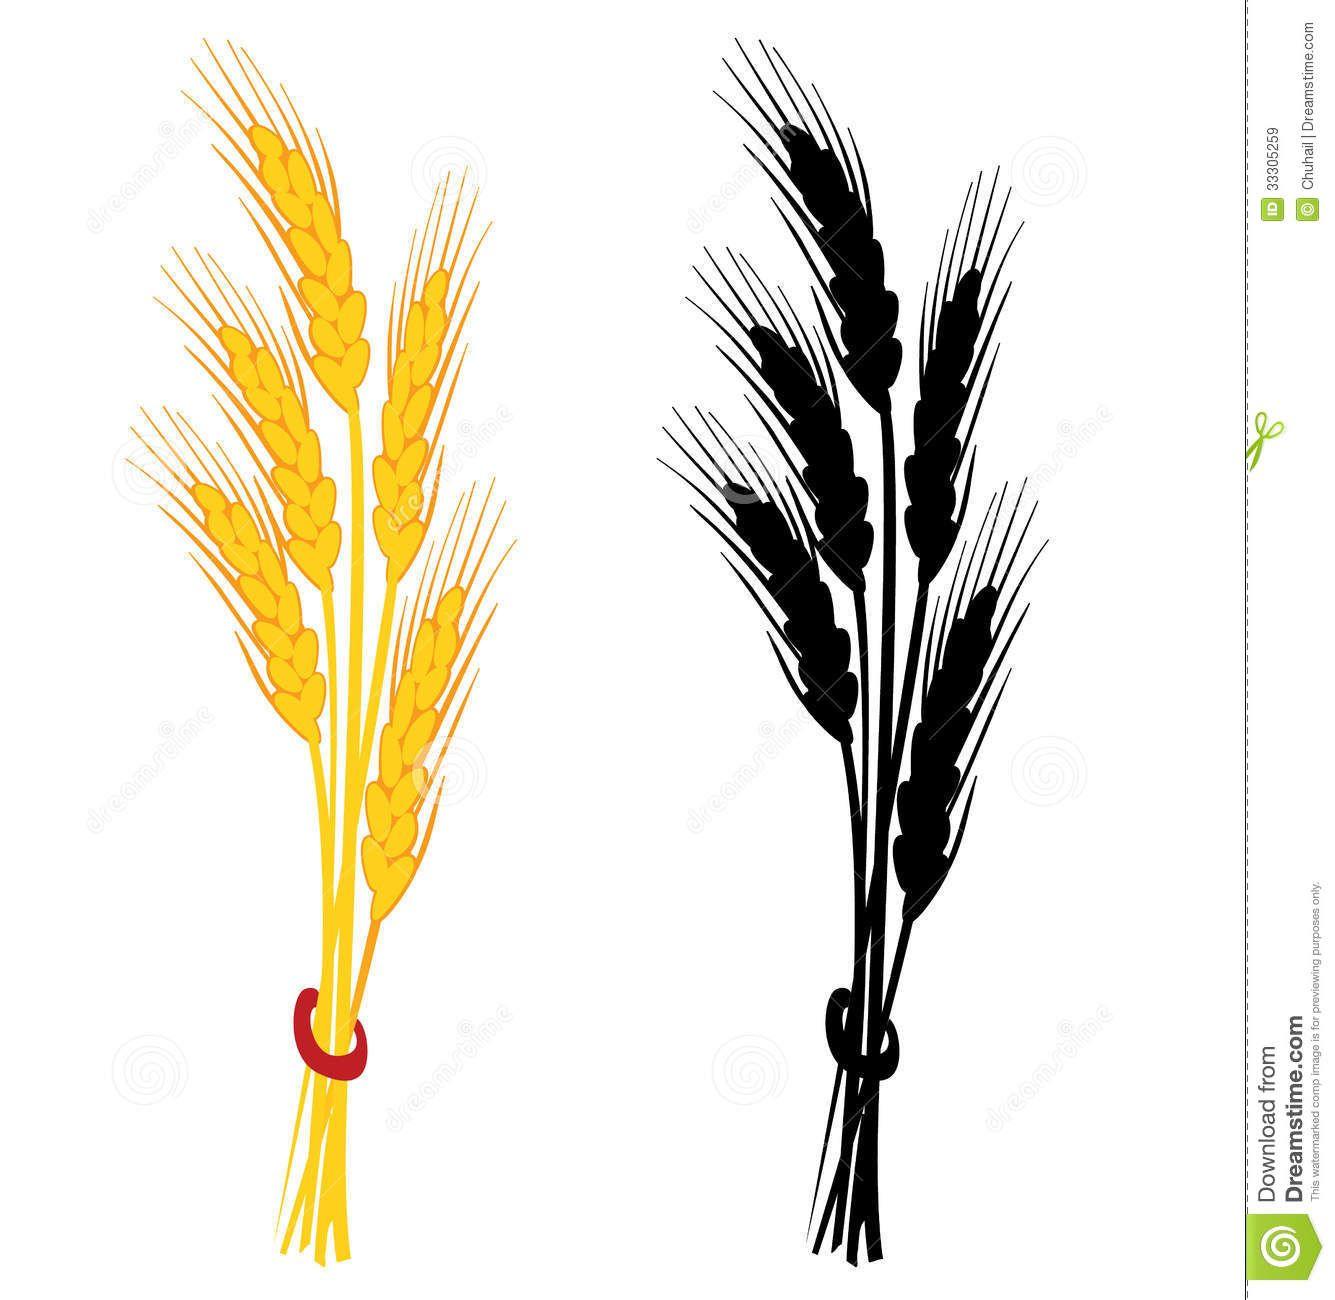 small wheat sheaf vector.